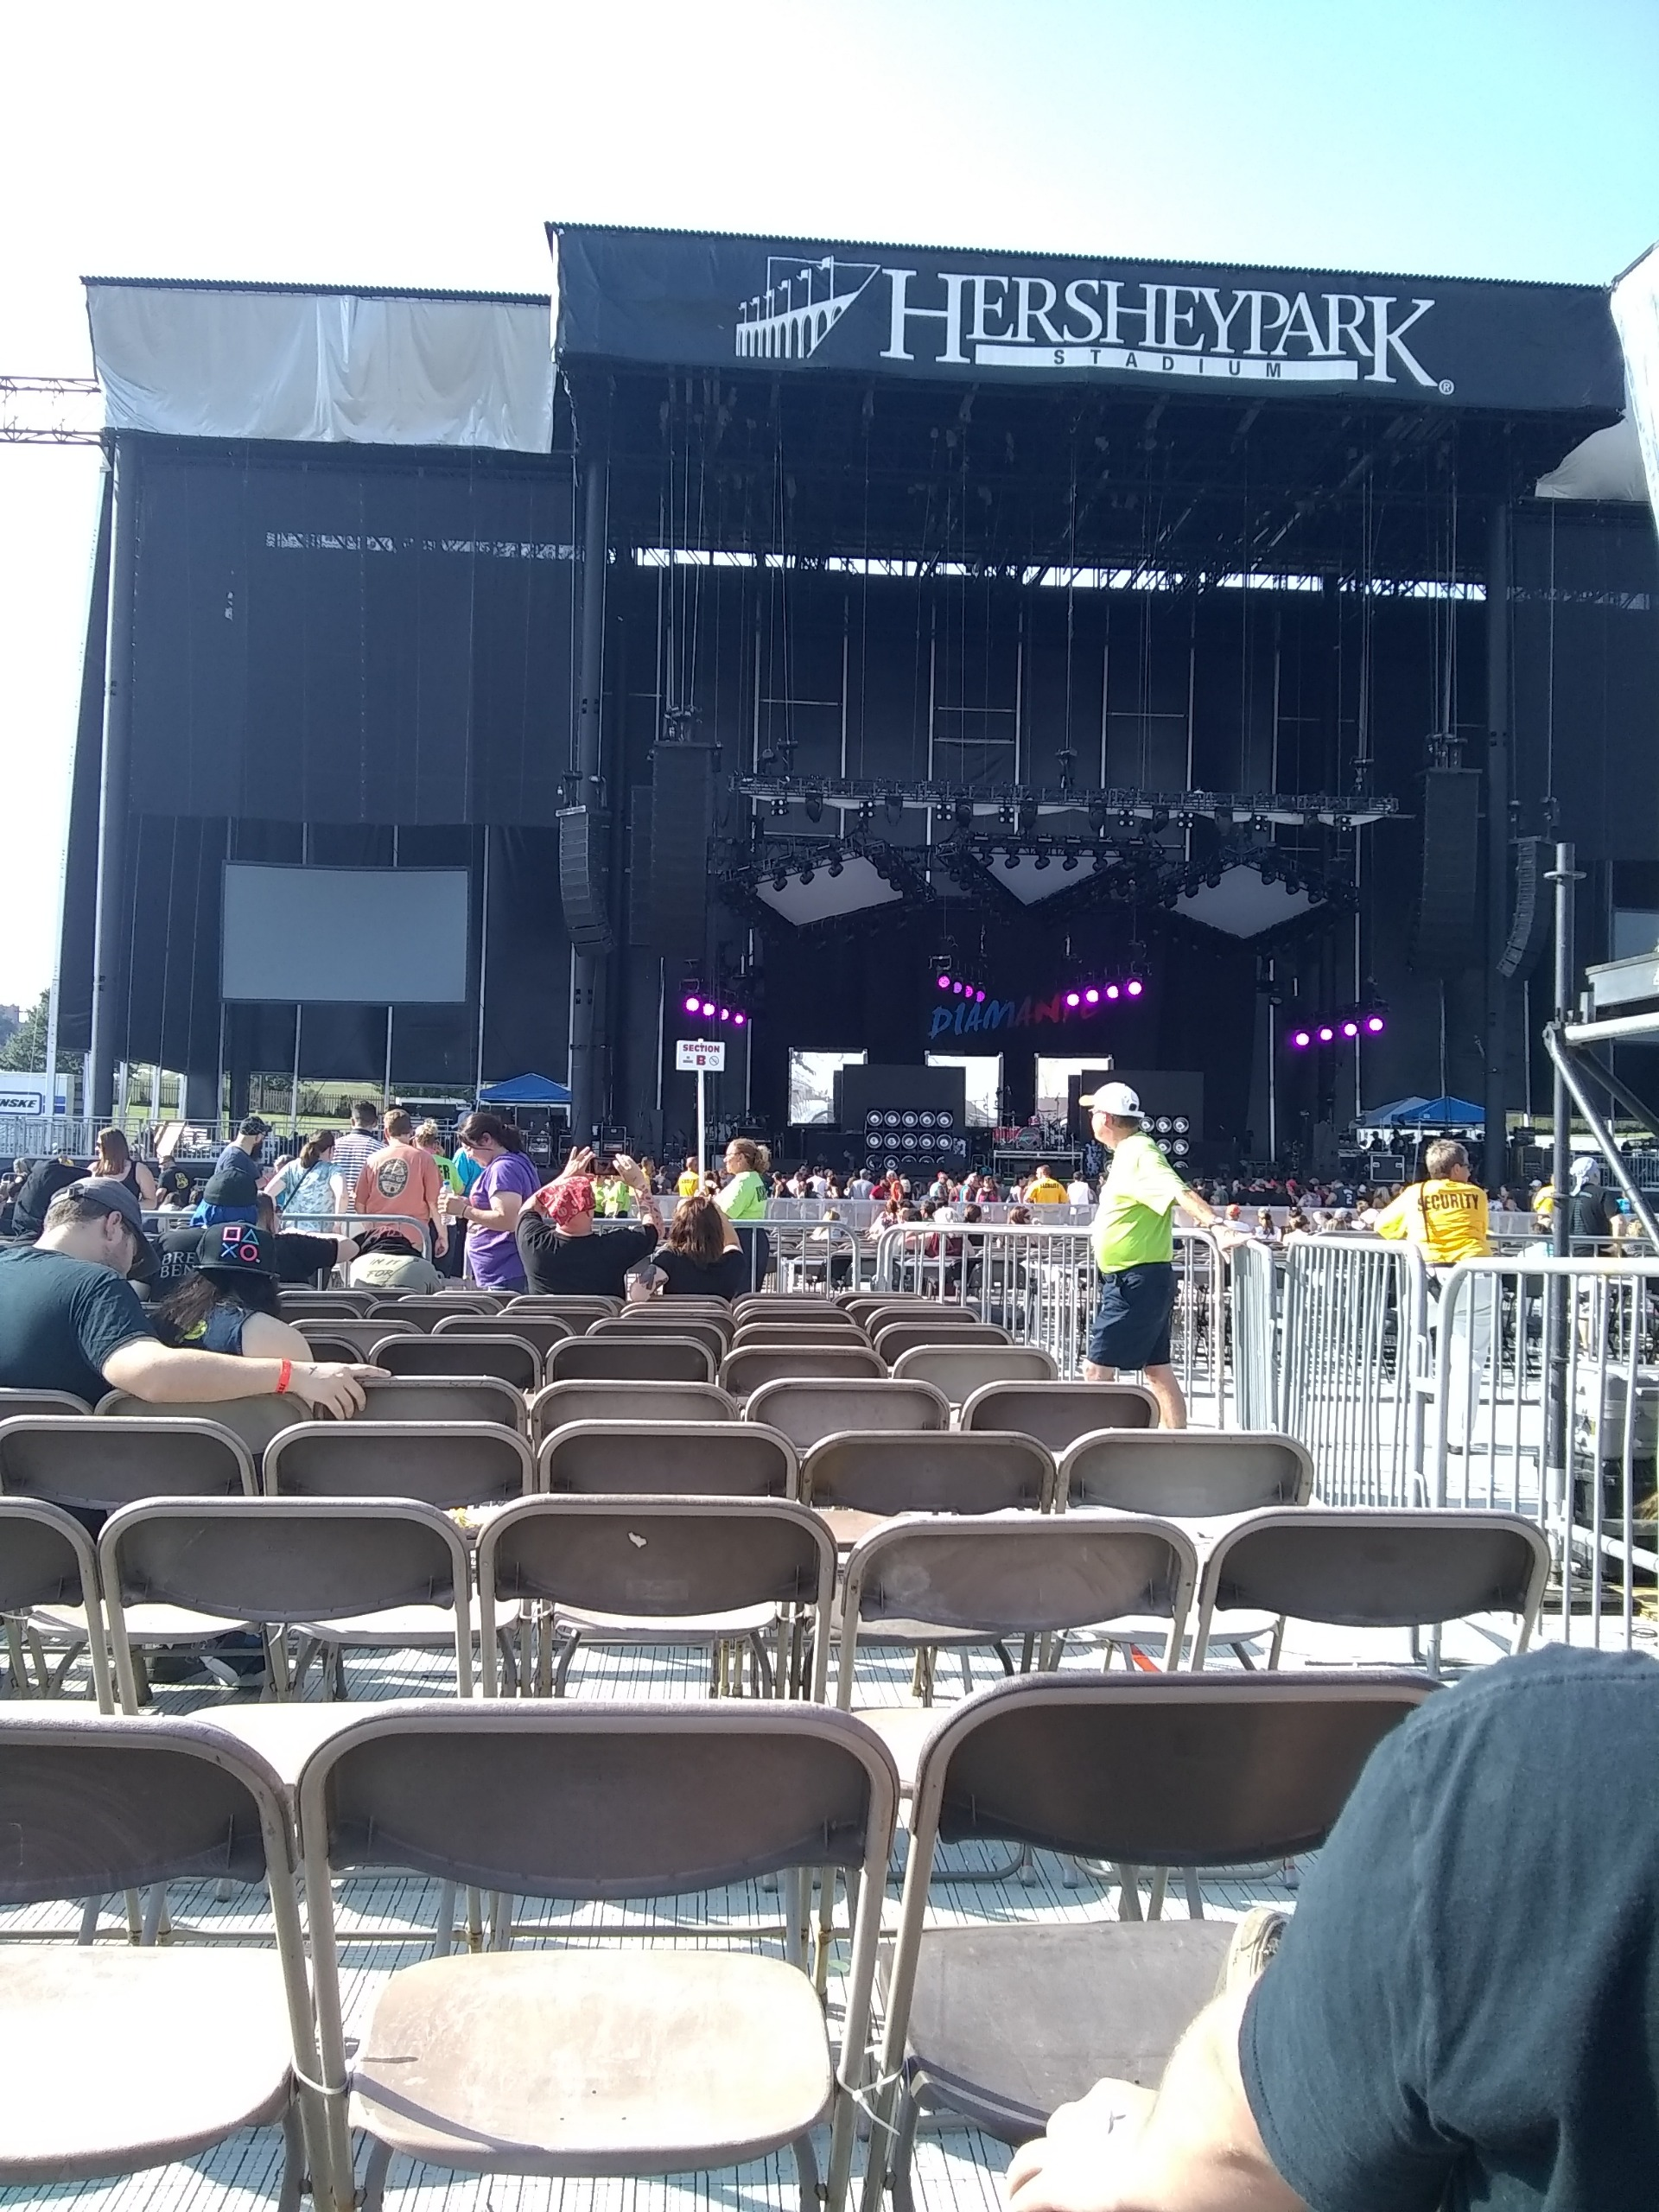 Hershey Park Stadium Section E Row 11 Seat 3